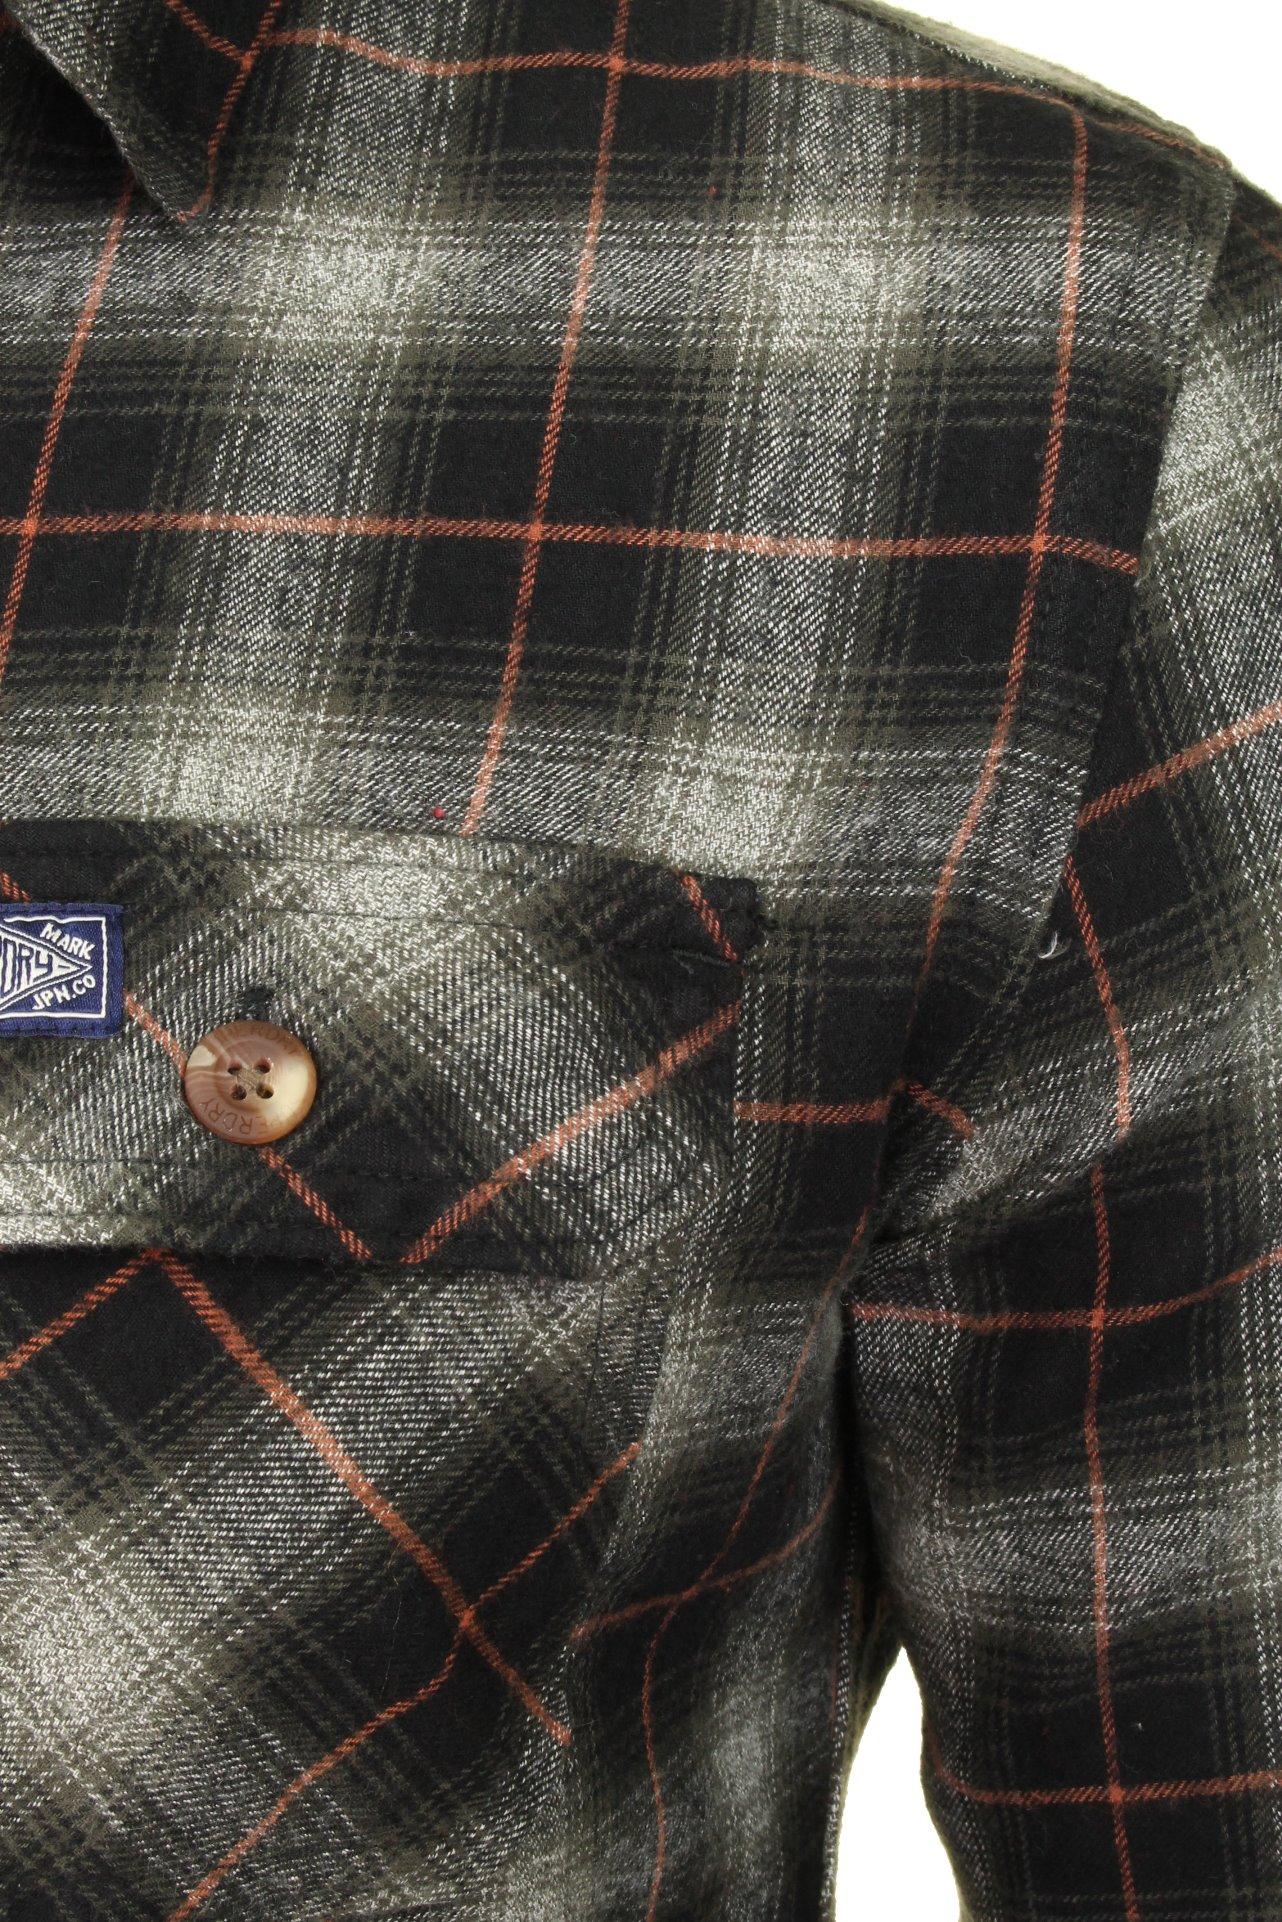 Superdry-Mens-Check-Shirt-039-Classic-Lumberjack-Shirt-039-Long-Sleeved thumbnail 4